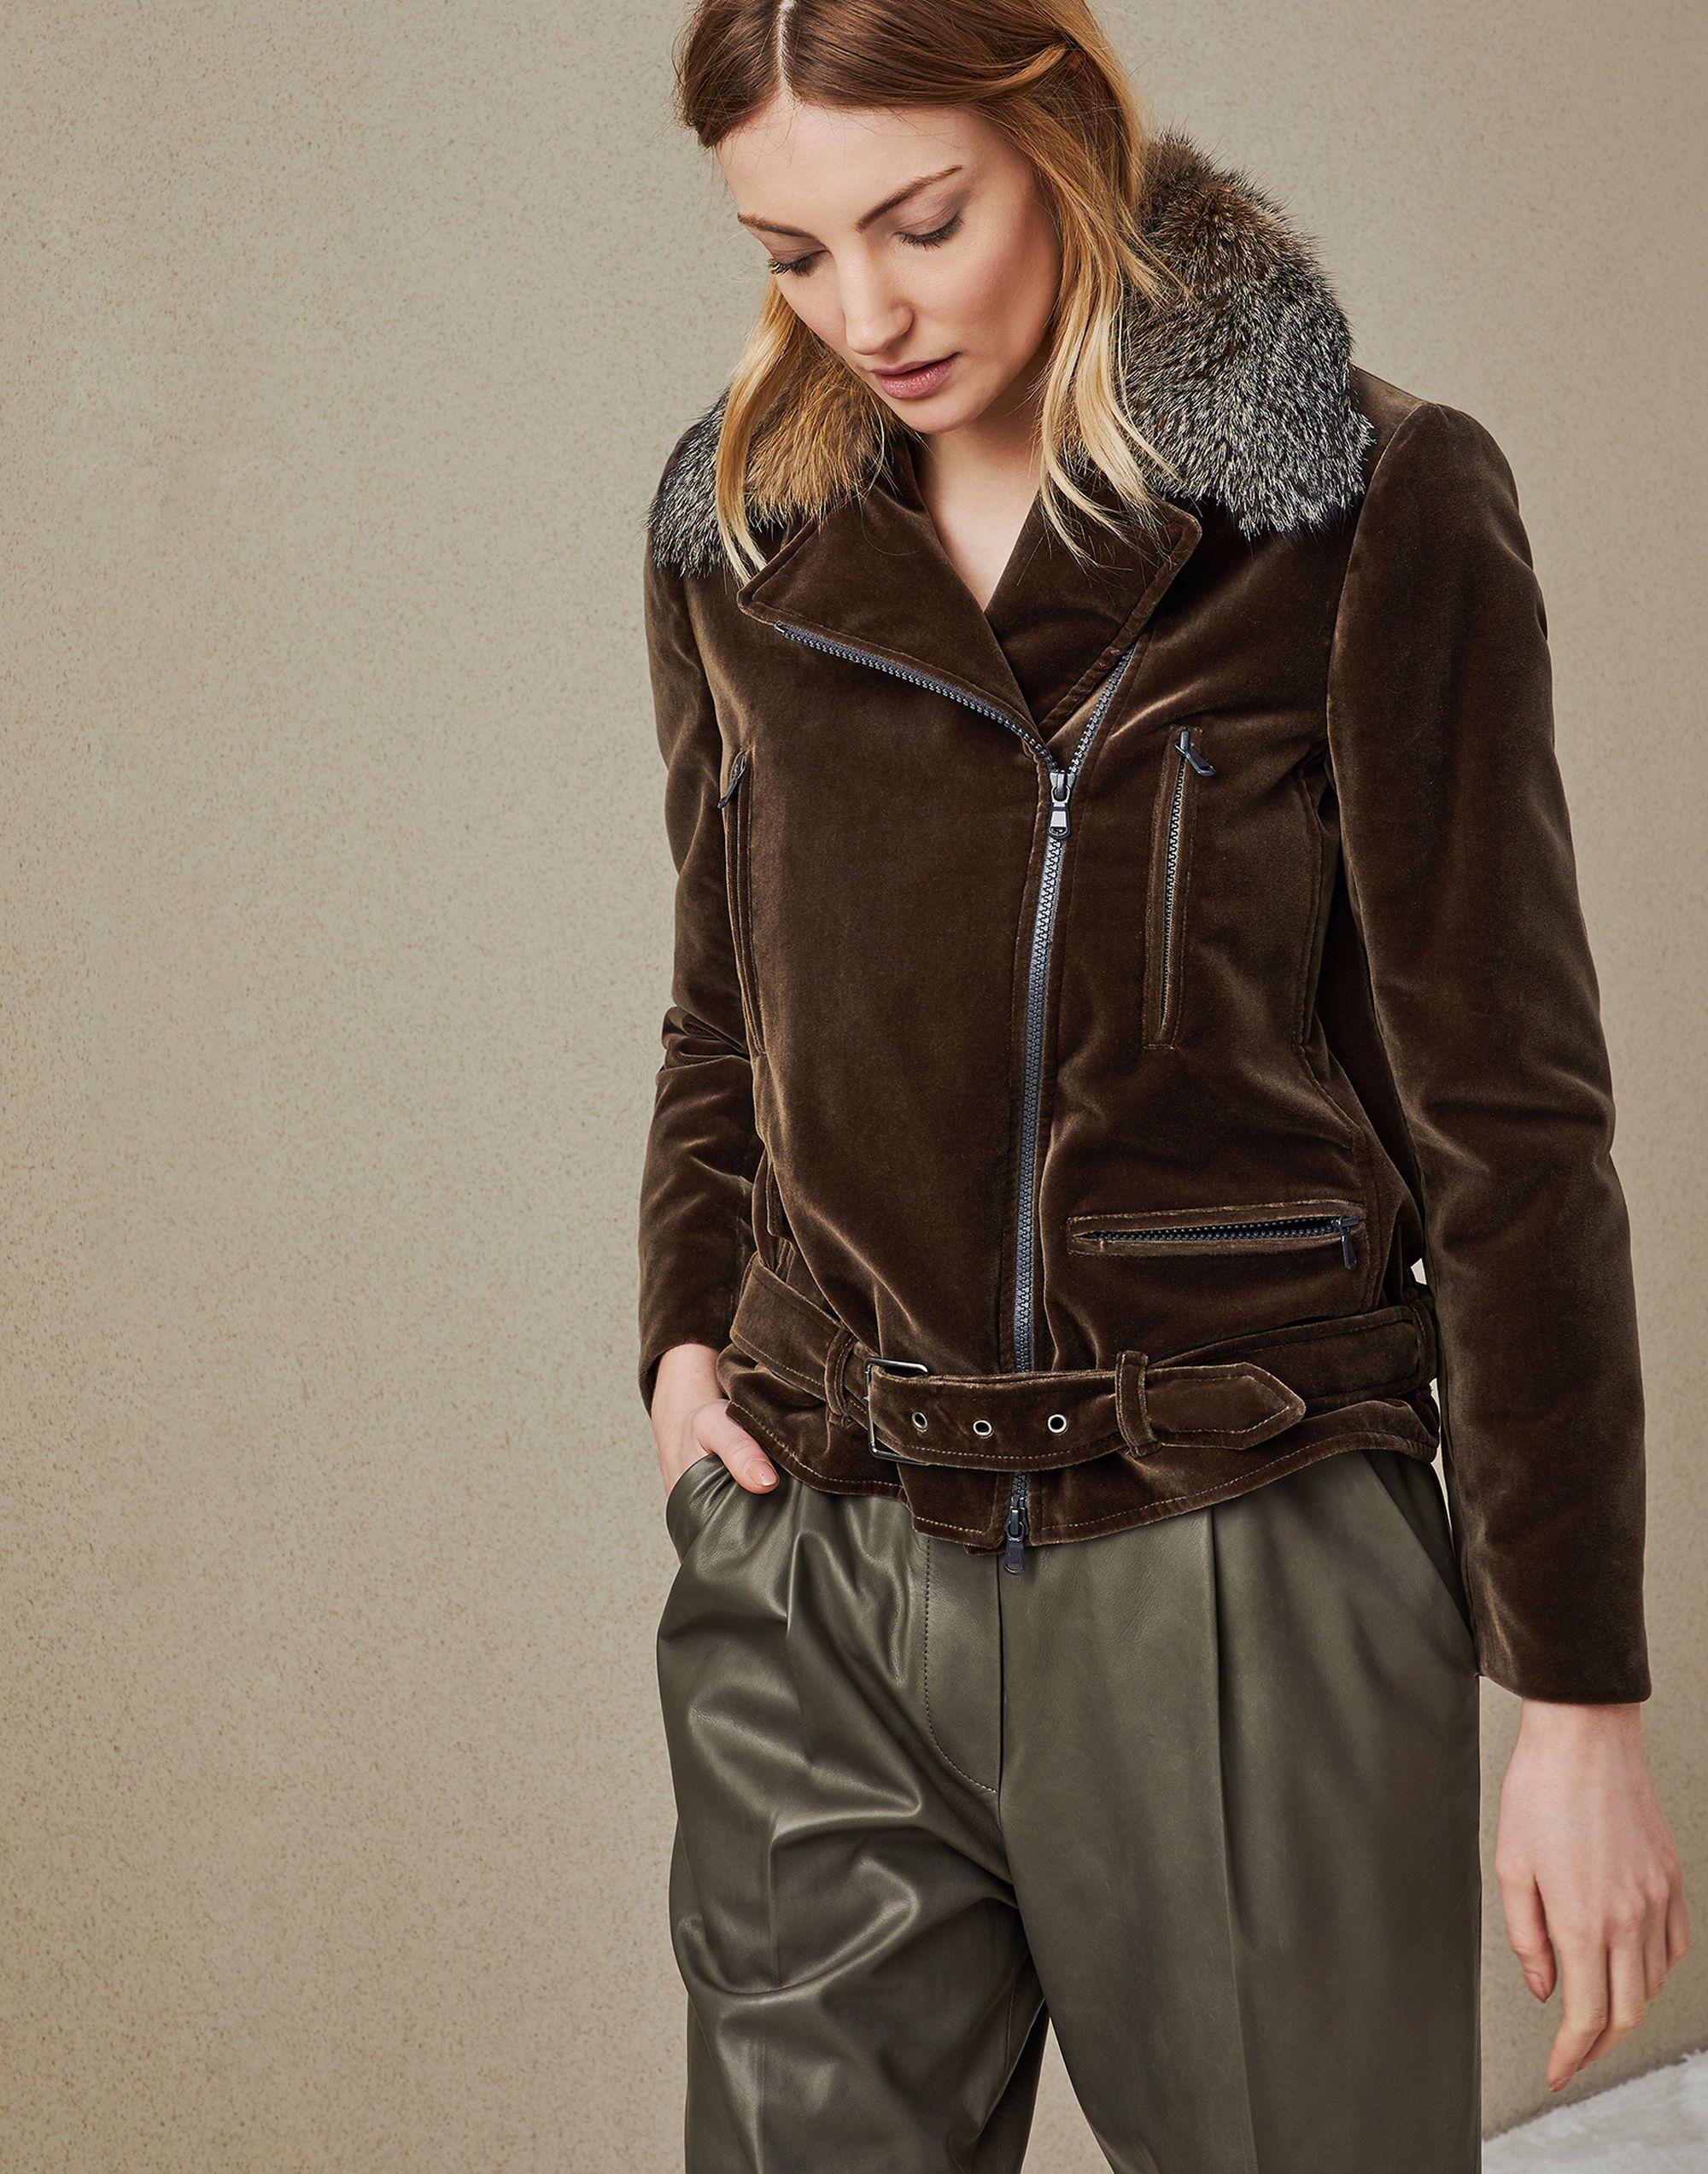 Outerwear Jacket Military Woman 1 Brunello Cucinelli Outerwear Jackets Clothes Velvet Suits [ 2546 x 2000 Pixel ]